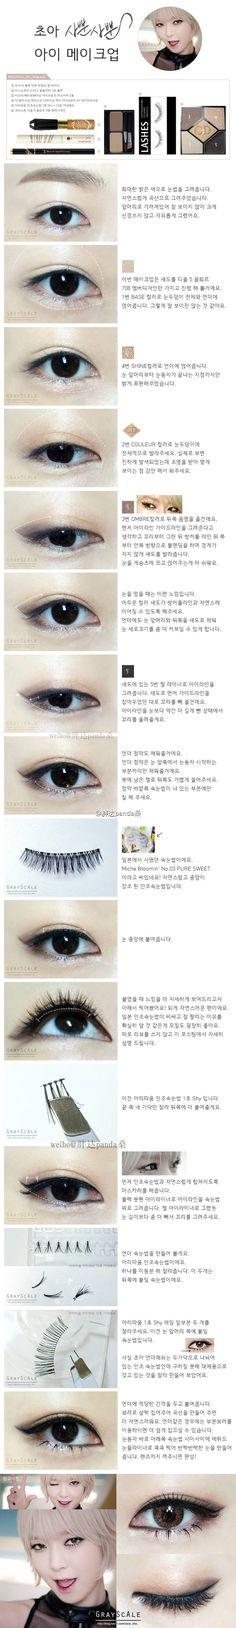 AOA CHOA 《LIKE A CAT》Korean kpop idol makeup tutorial (cr:coco_cho_.blog.me)